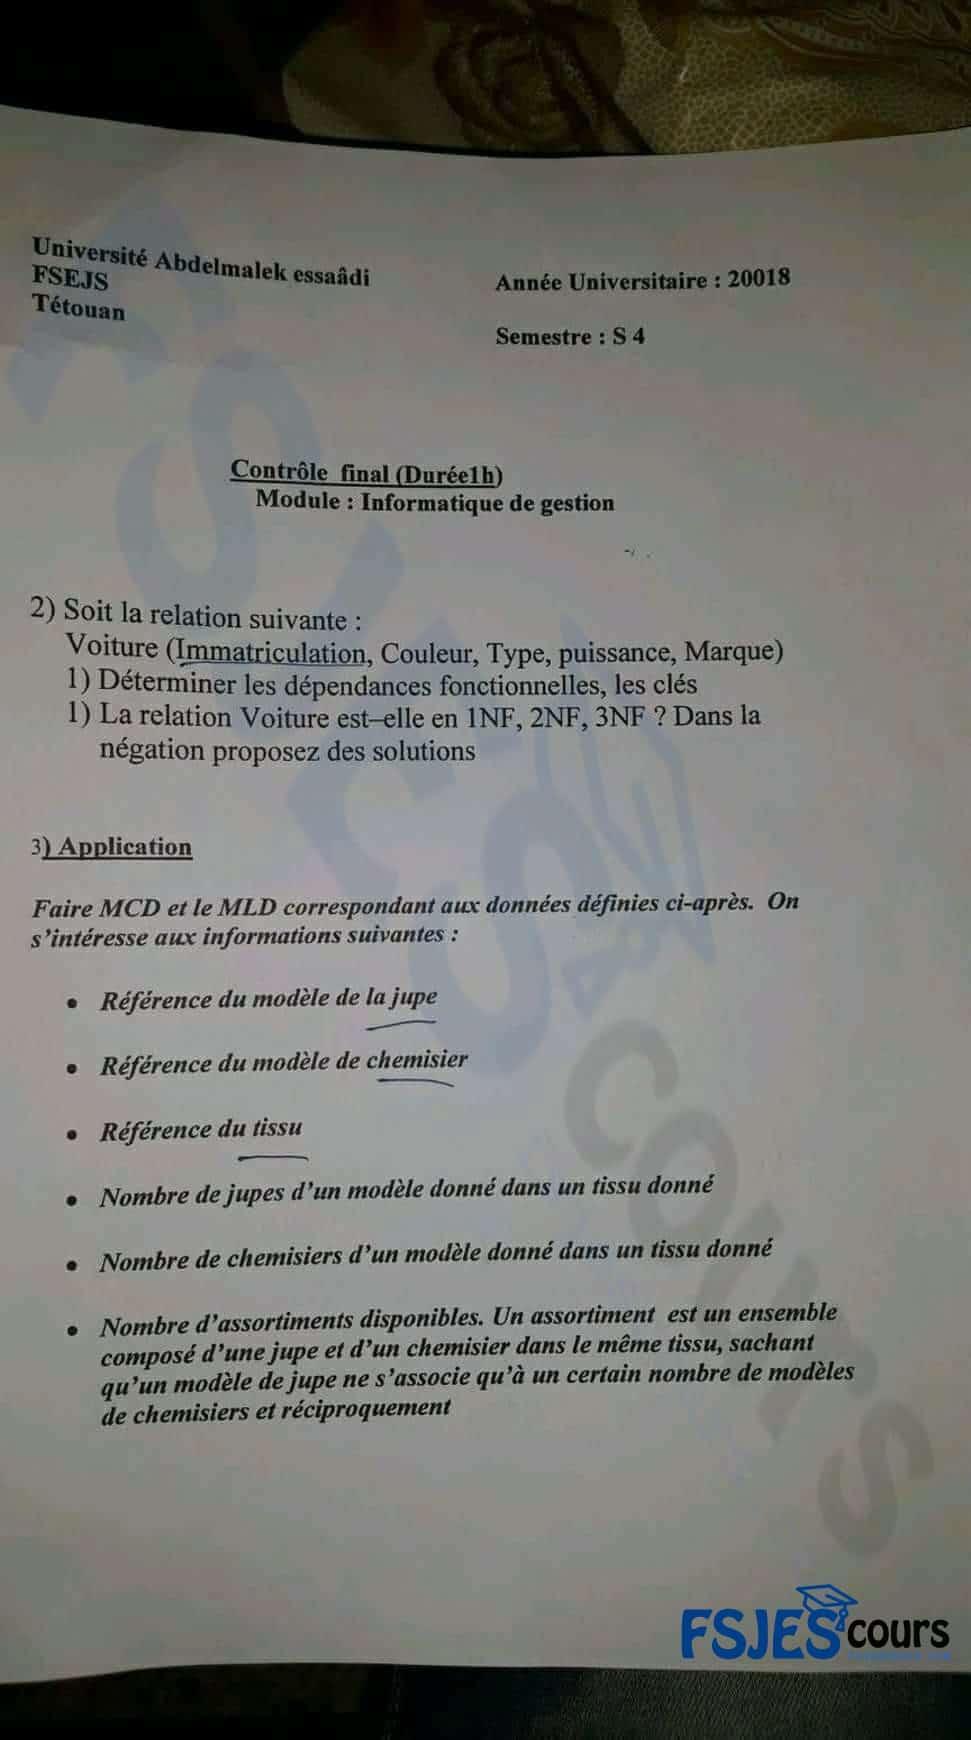 Examen d'infomatique